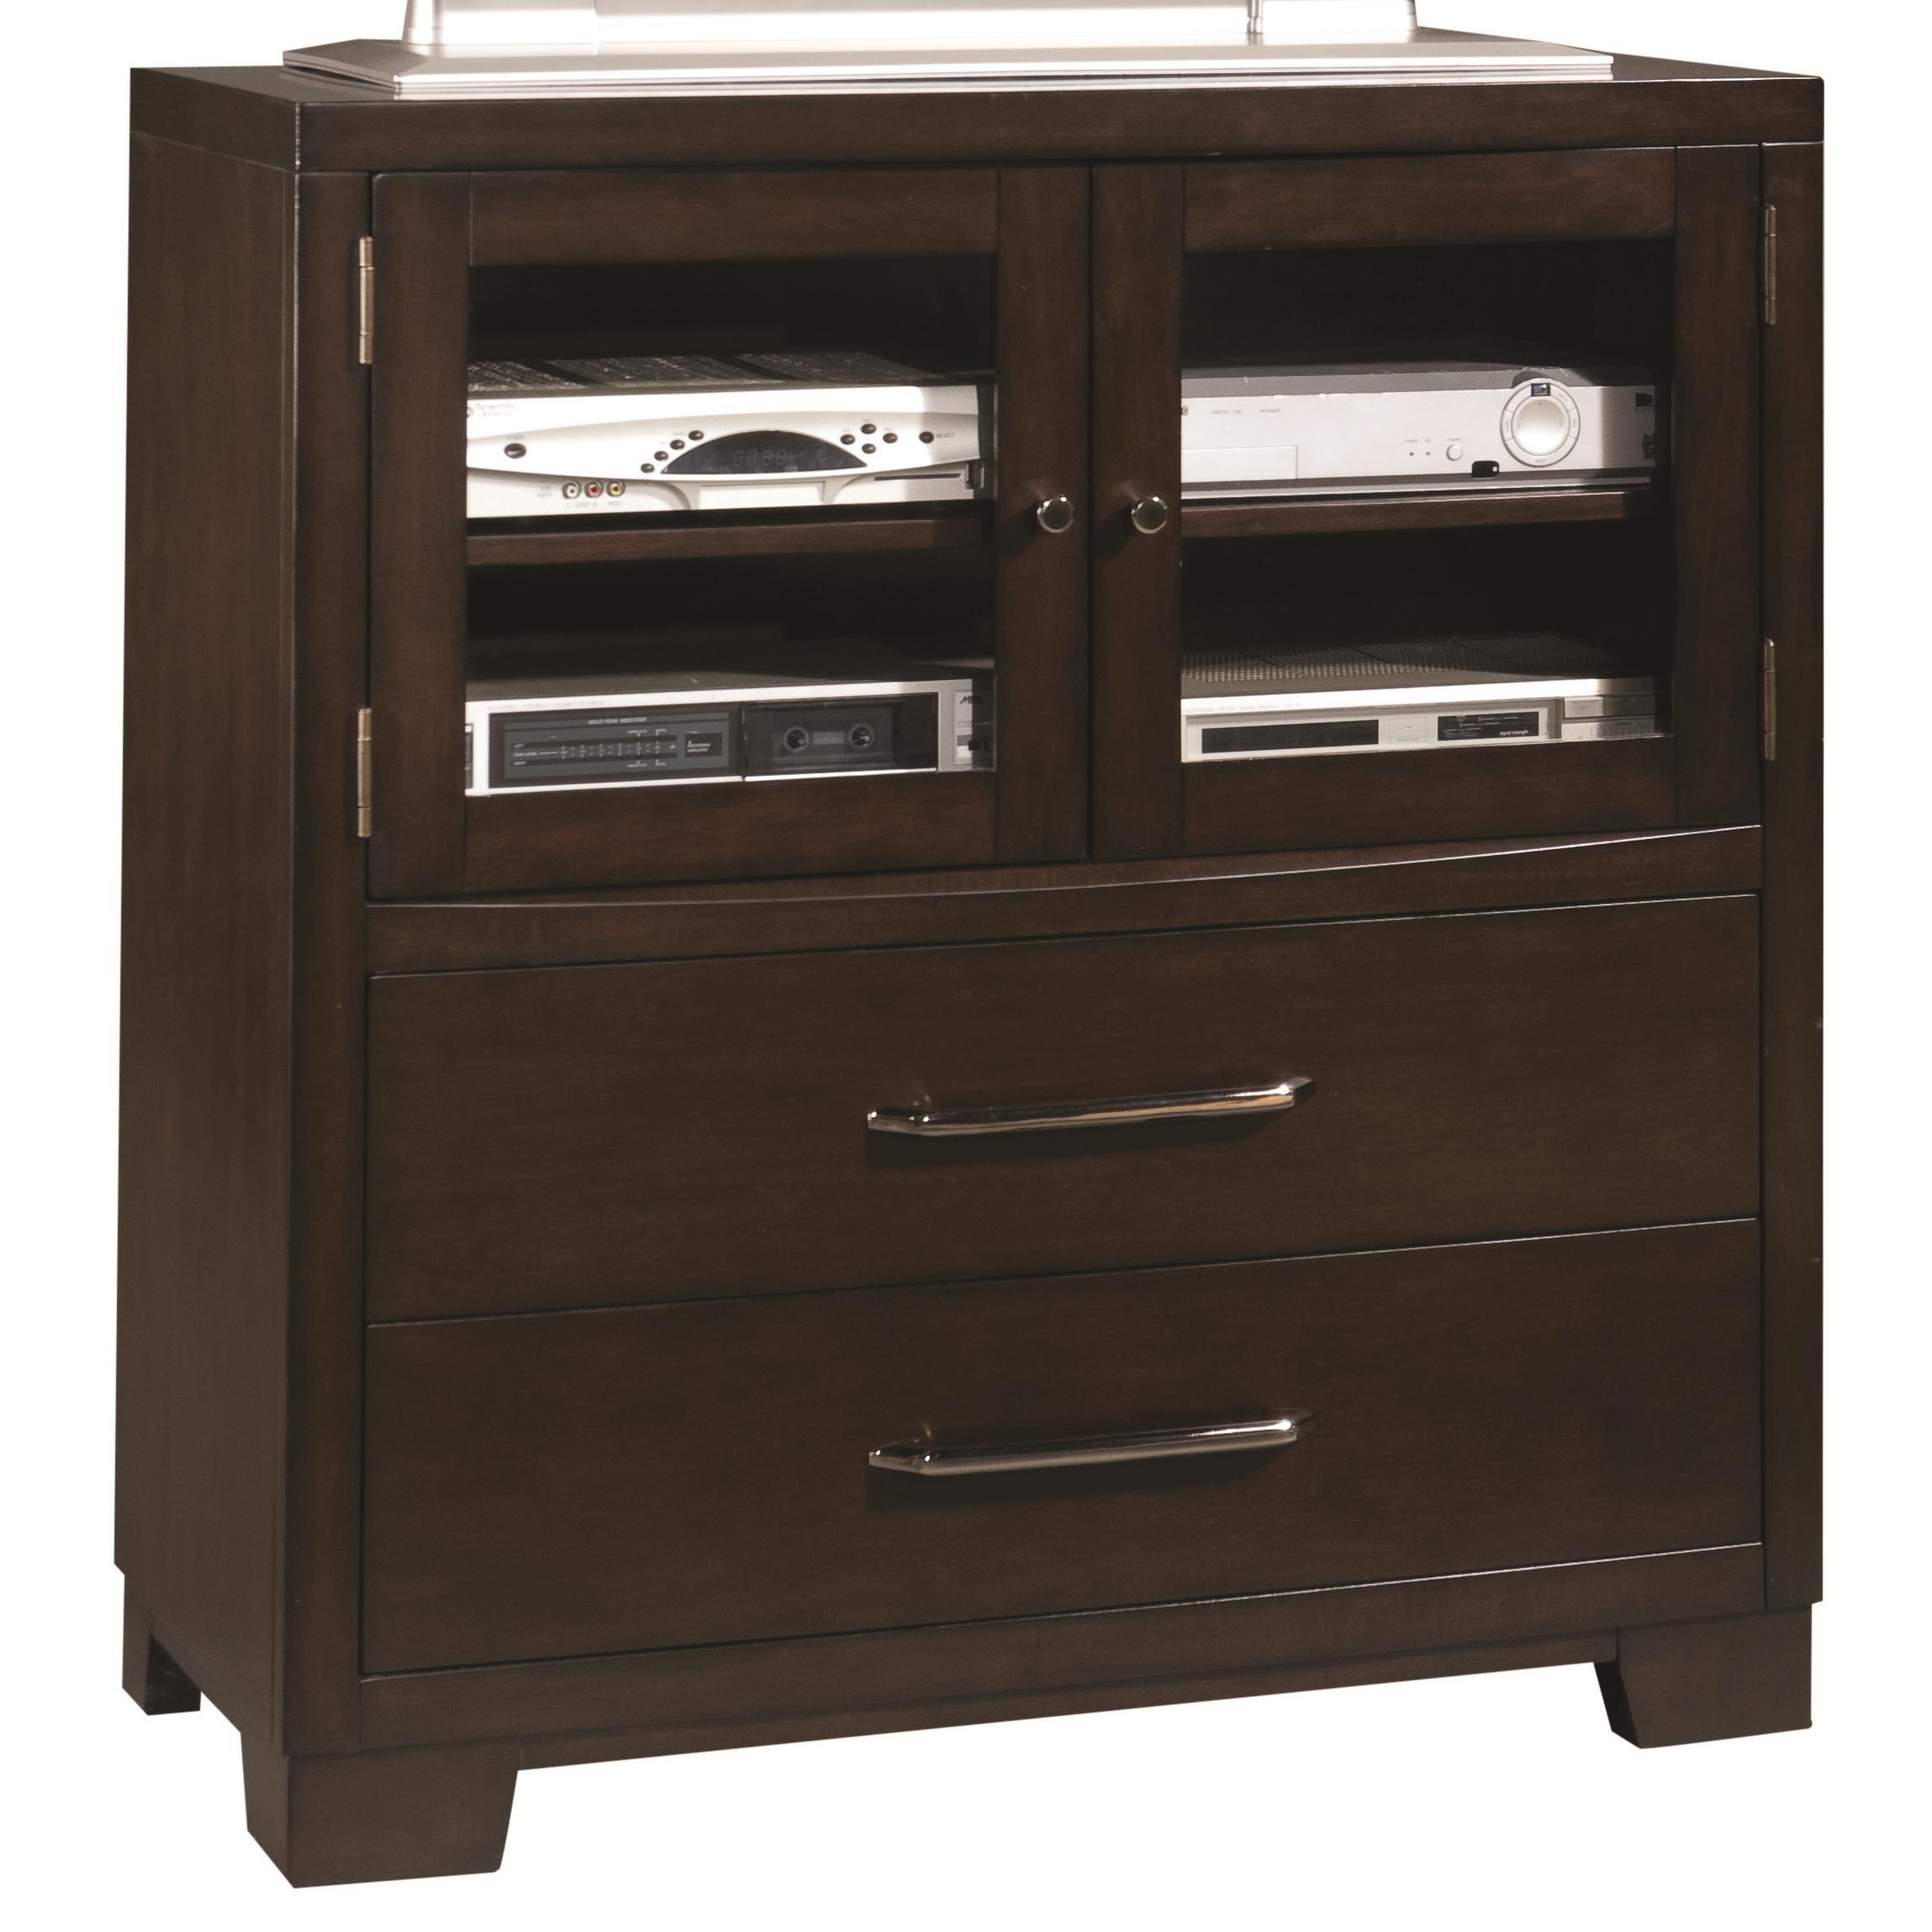 Pulaski Furniture Accents Media Chest - Item Number: 330145